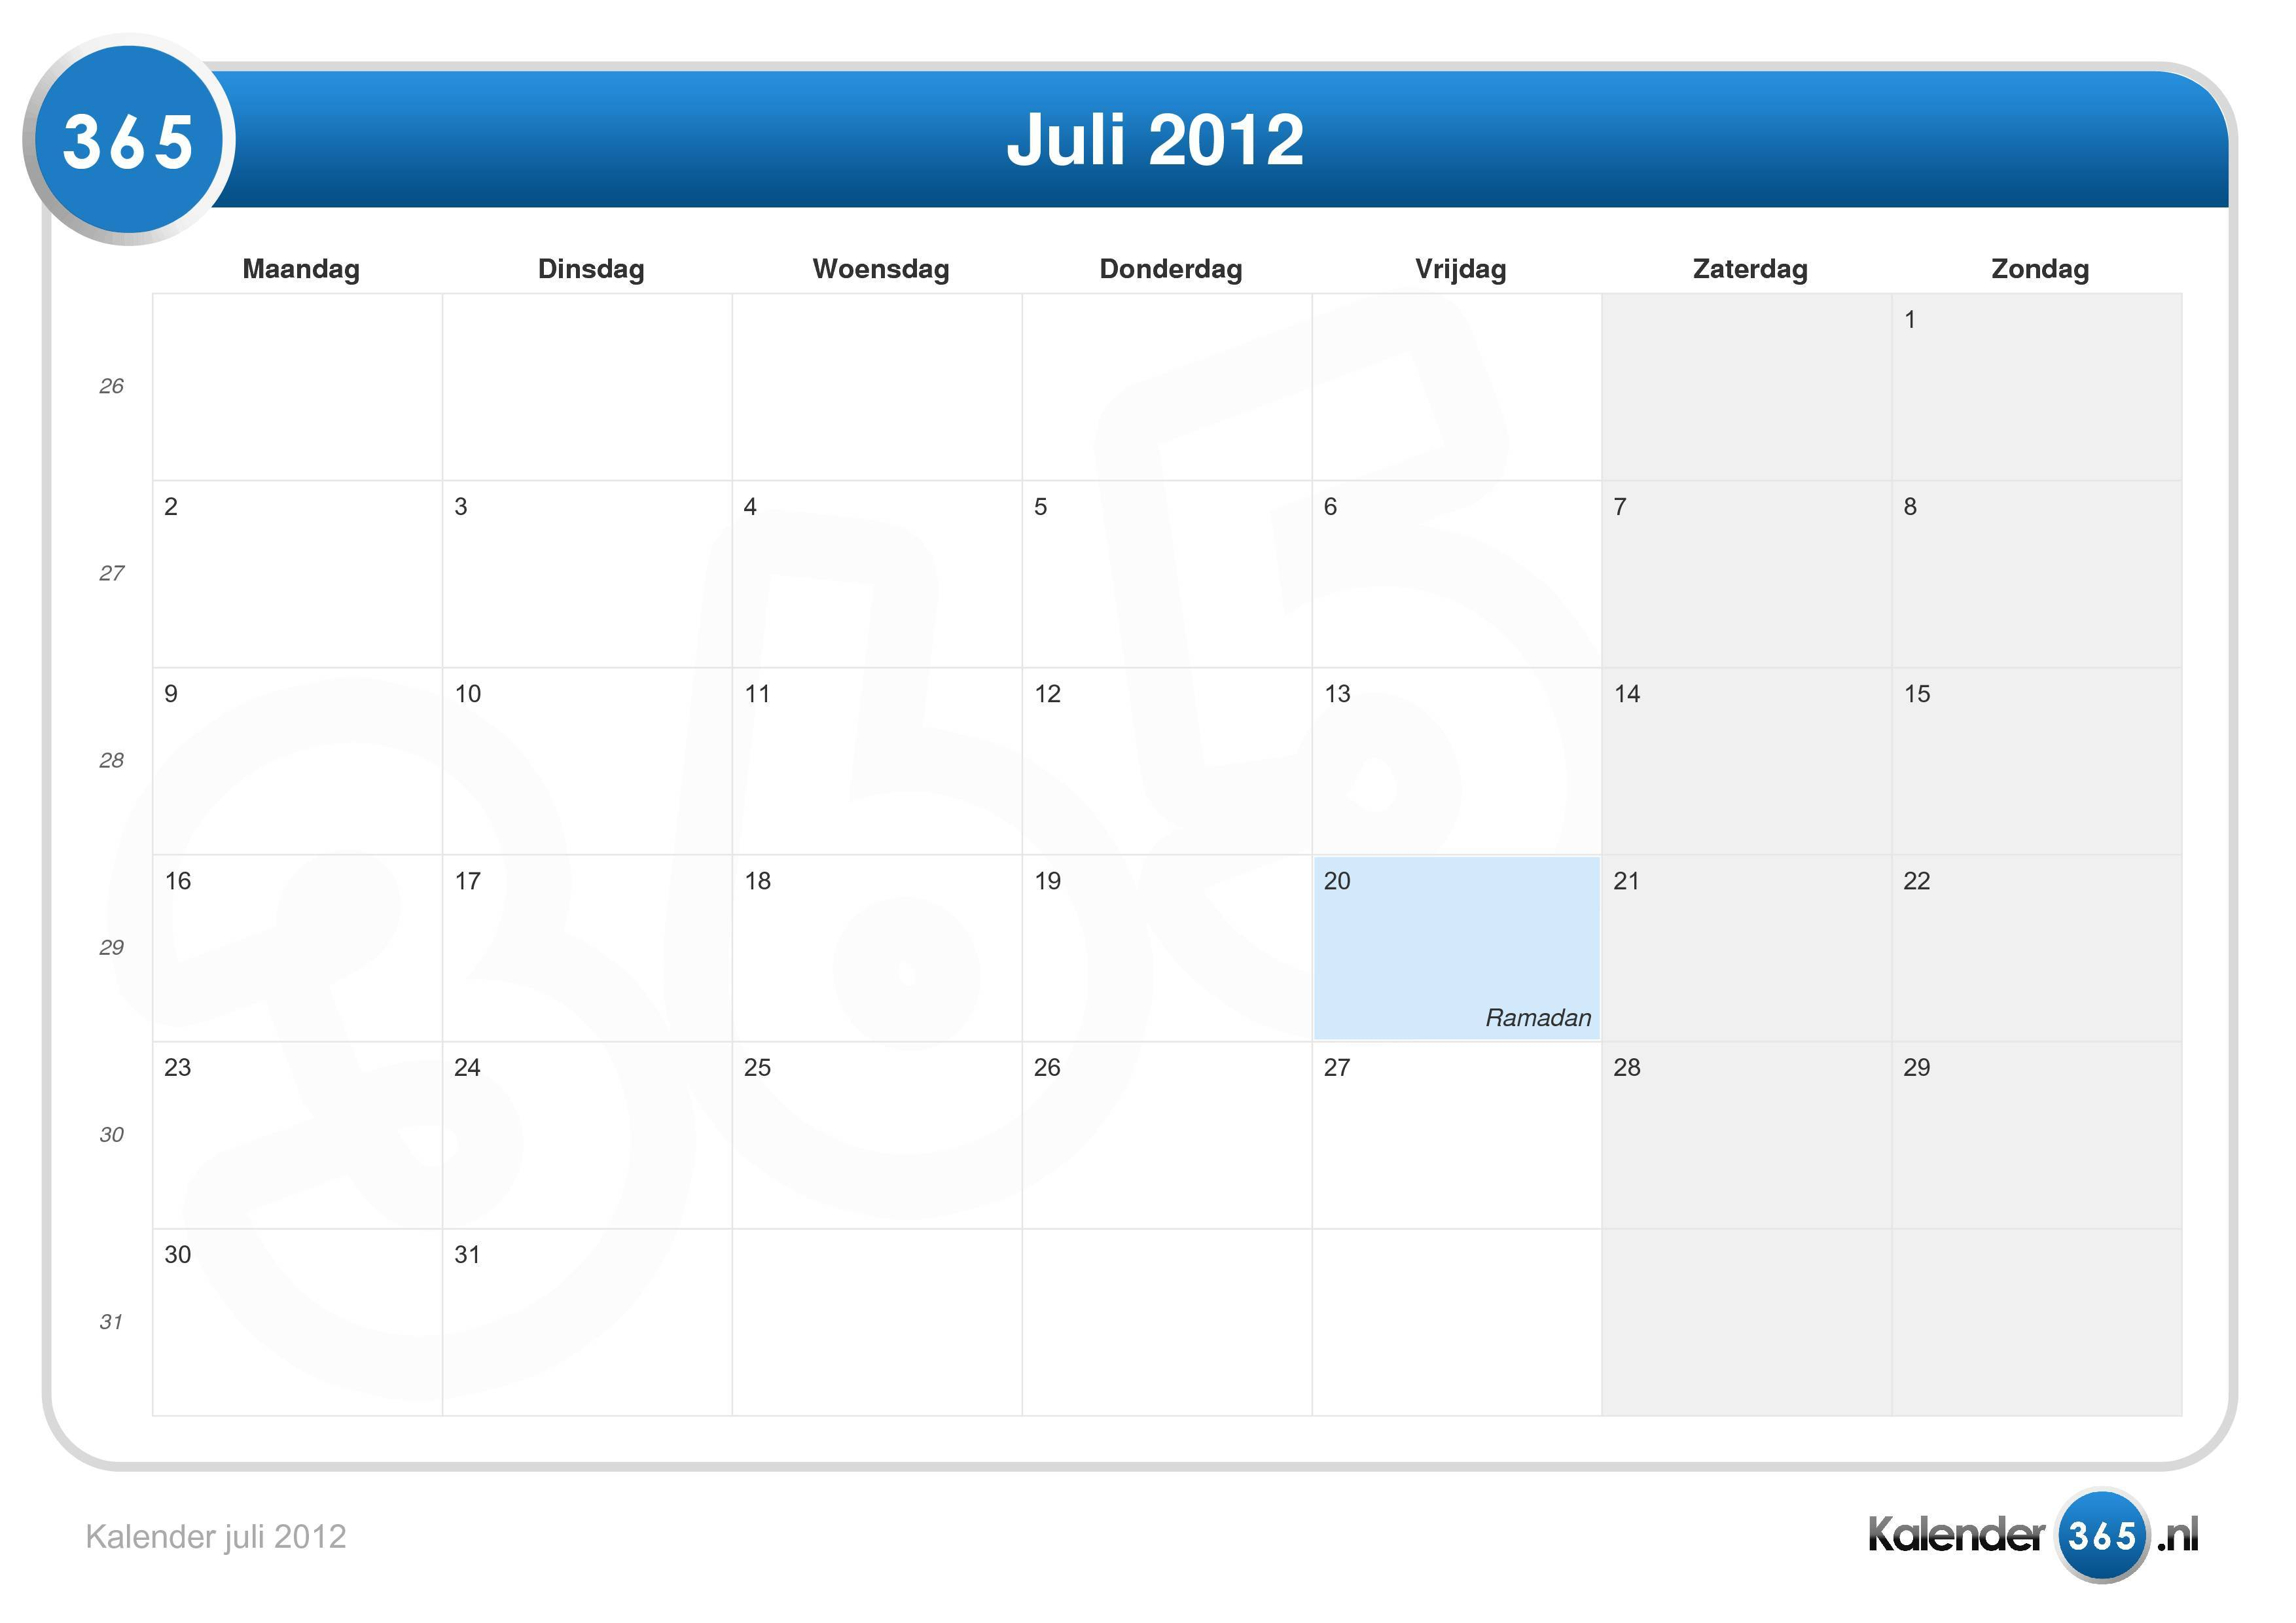 Kalender juli 2012